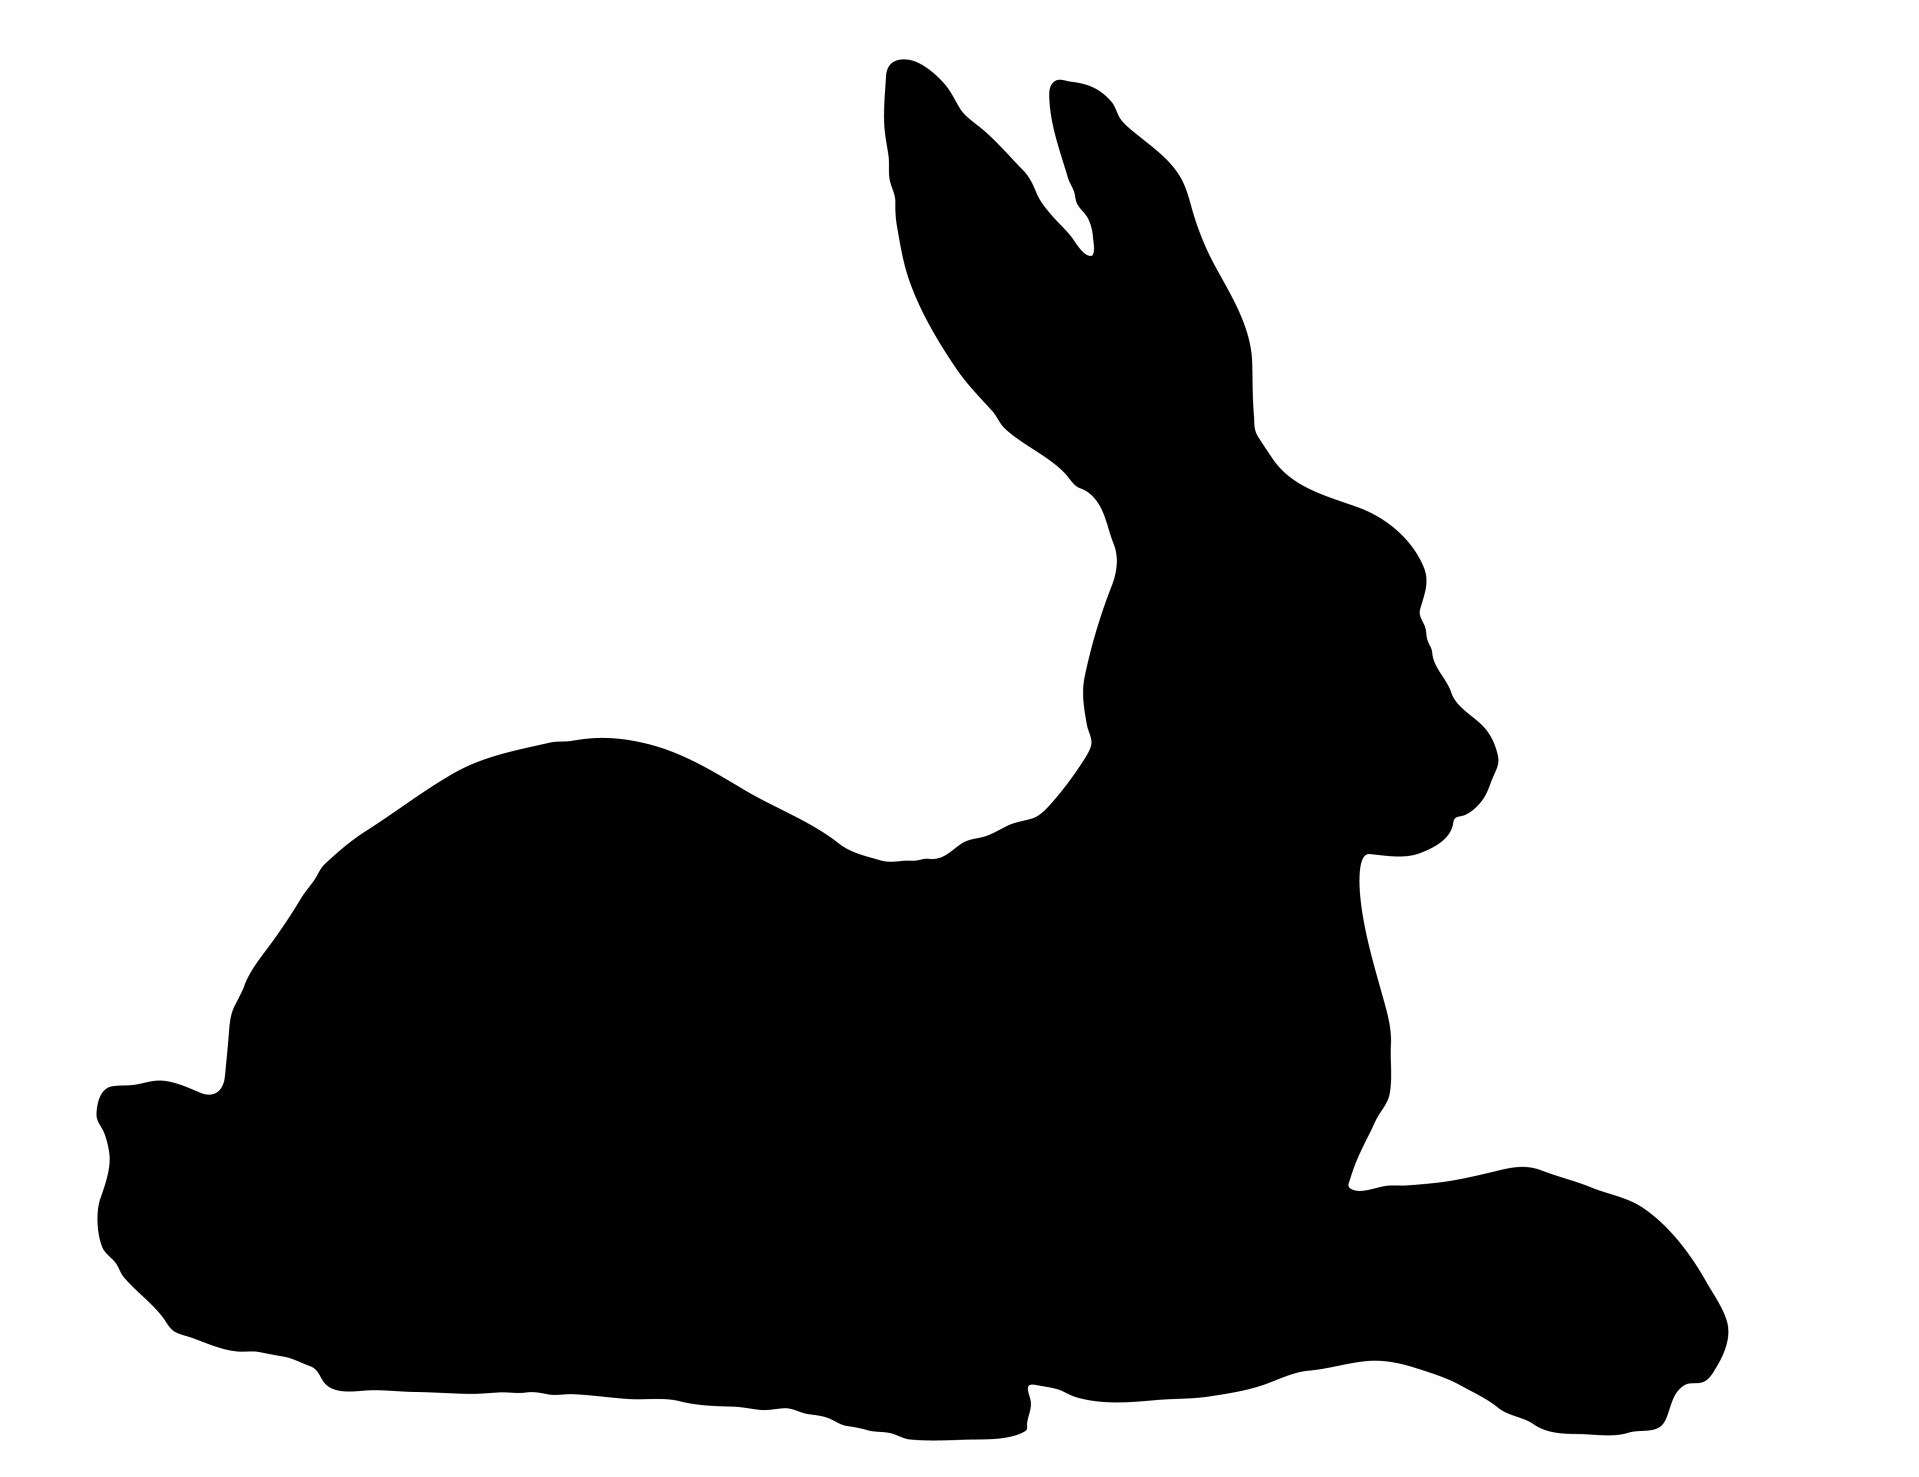 1919x1477 Rabbit Silhouette Clipart Free Stock Photo